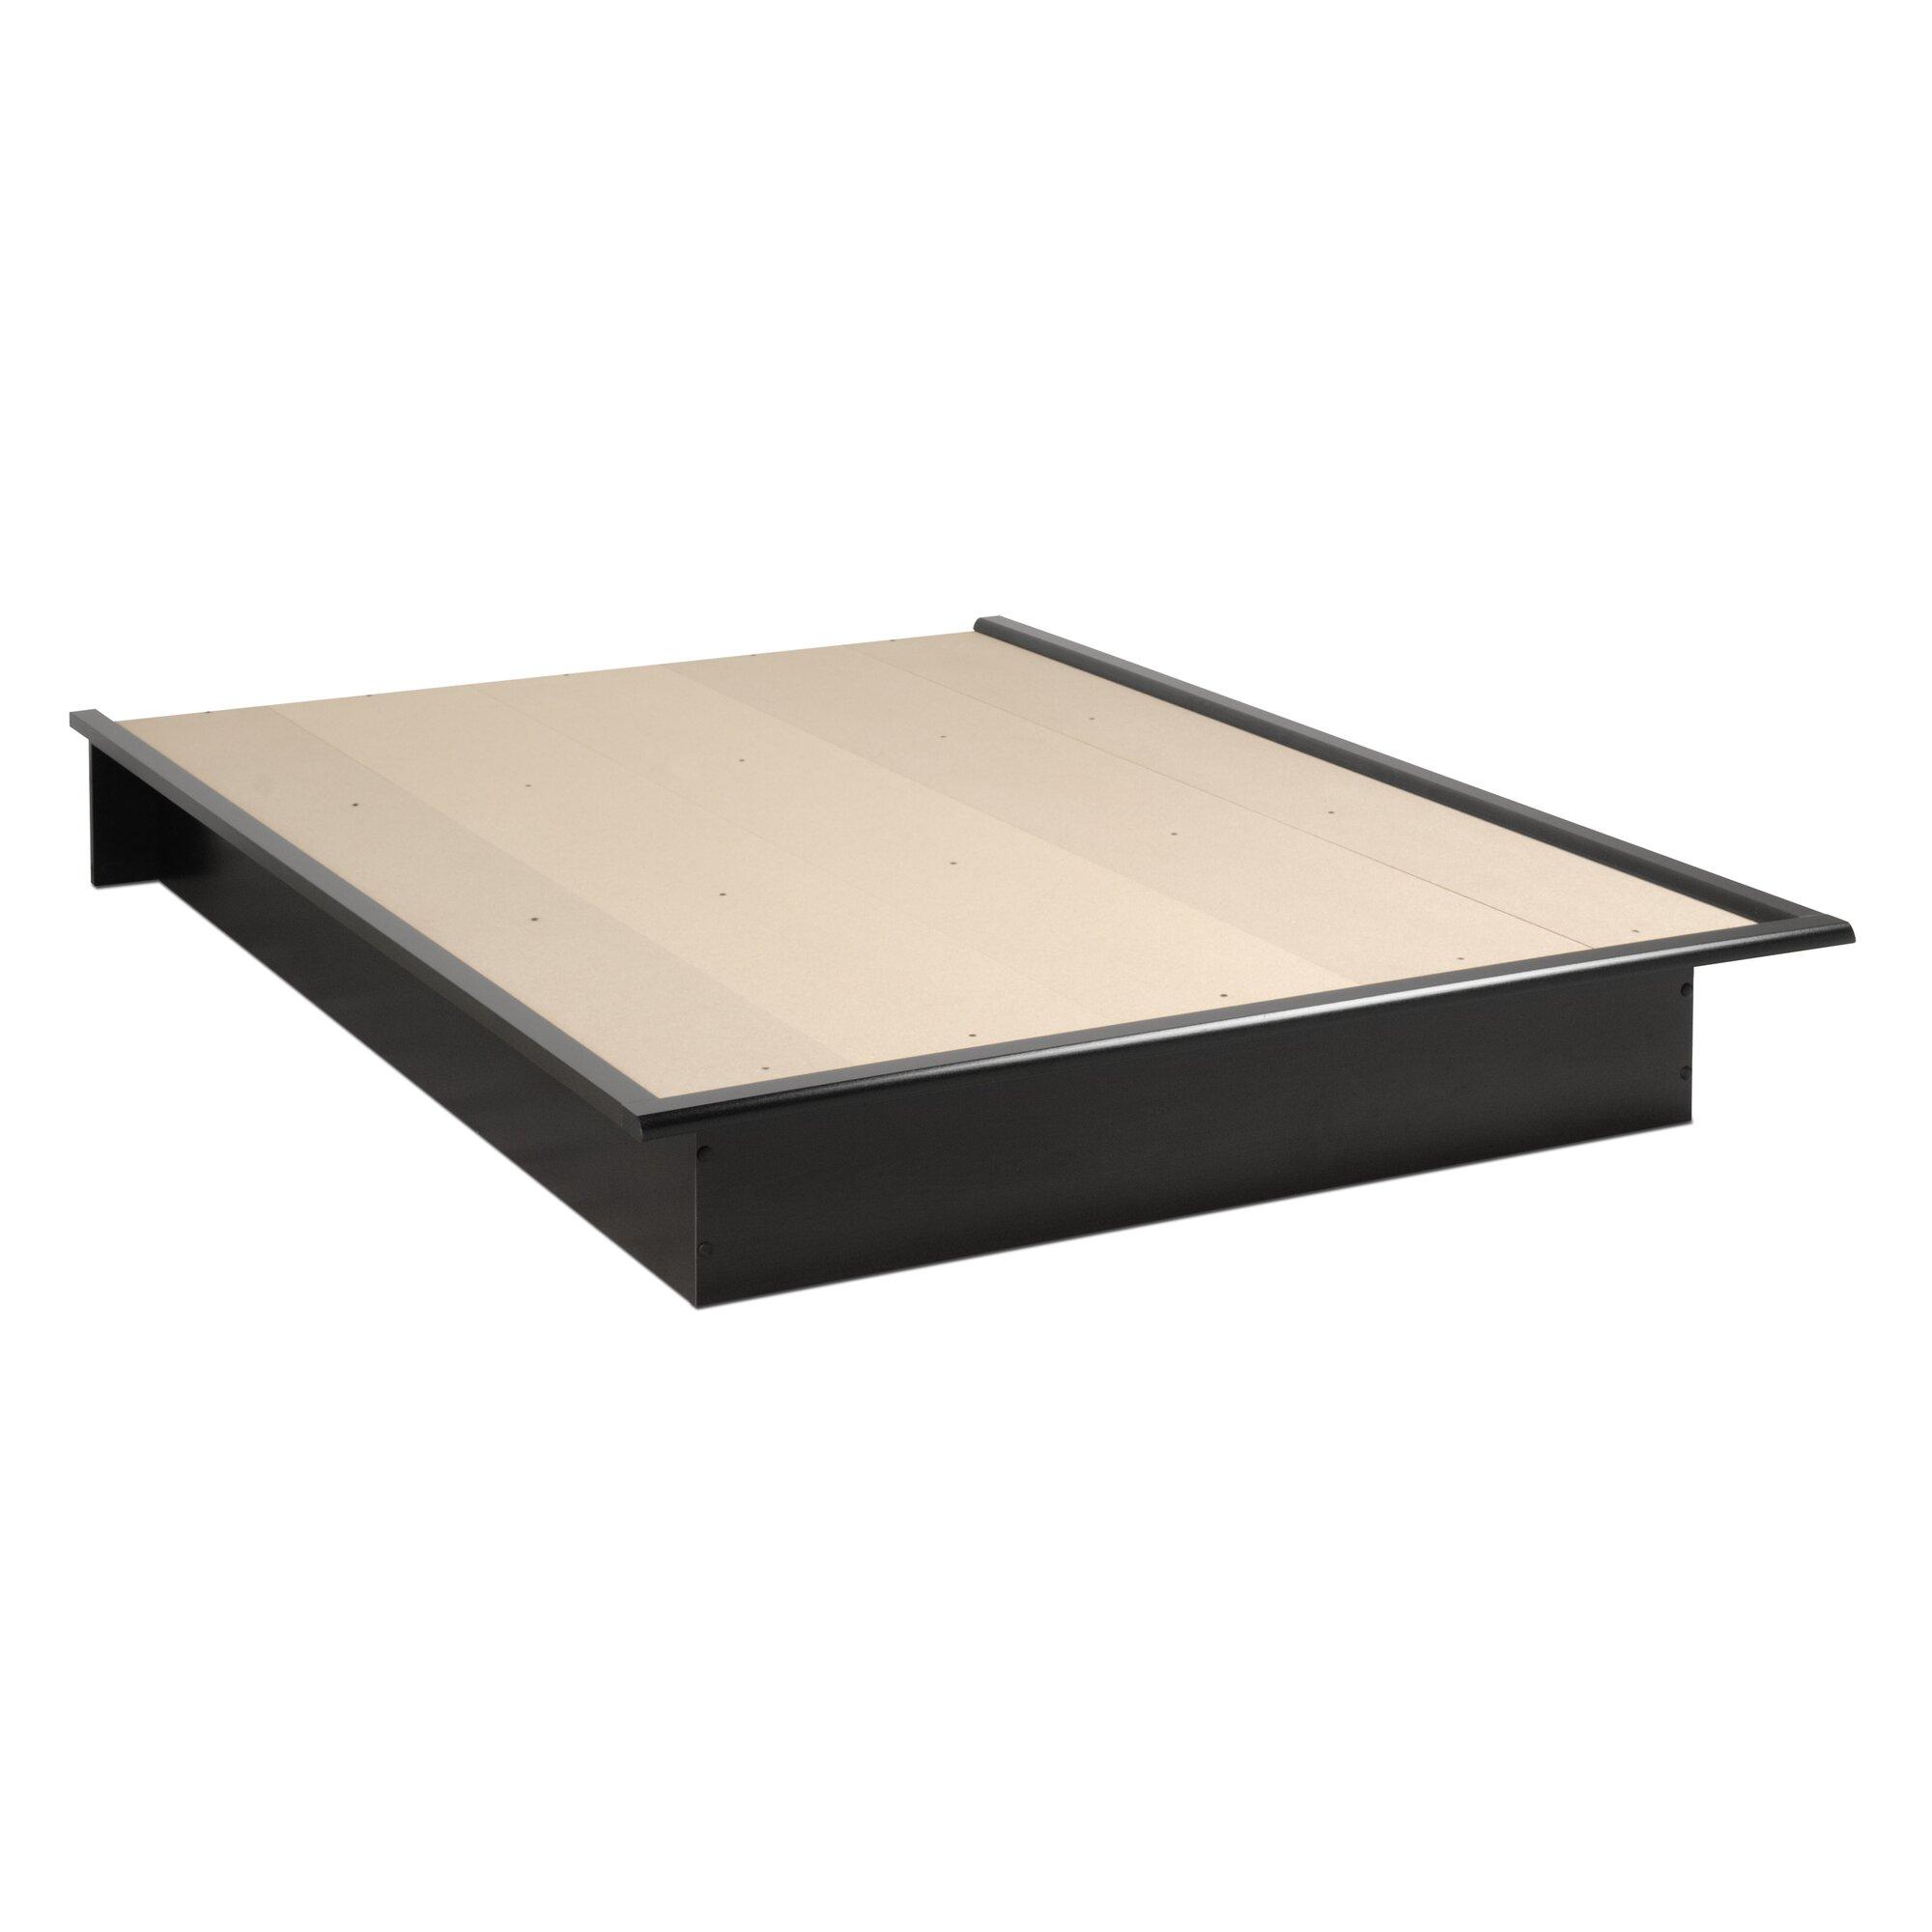 Roselawn Platform Bed Reviews Allmodern